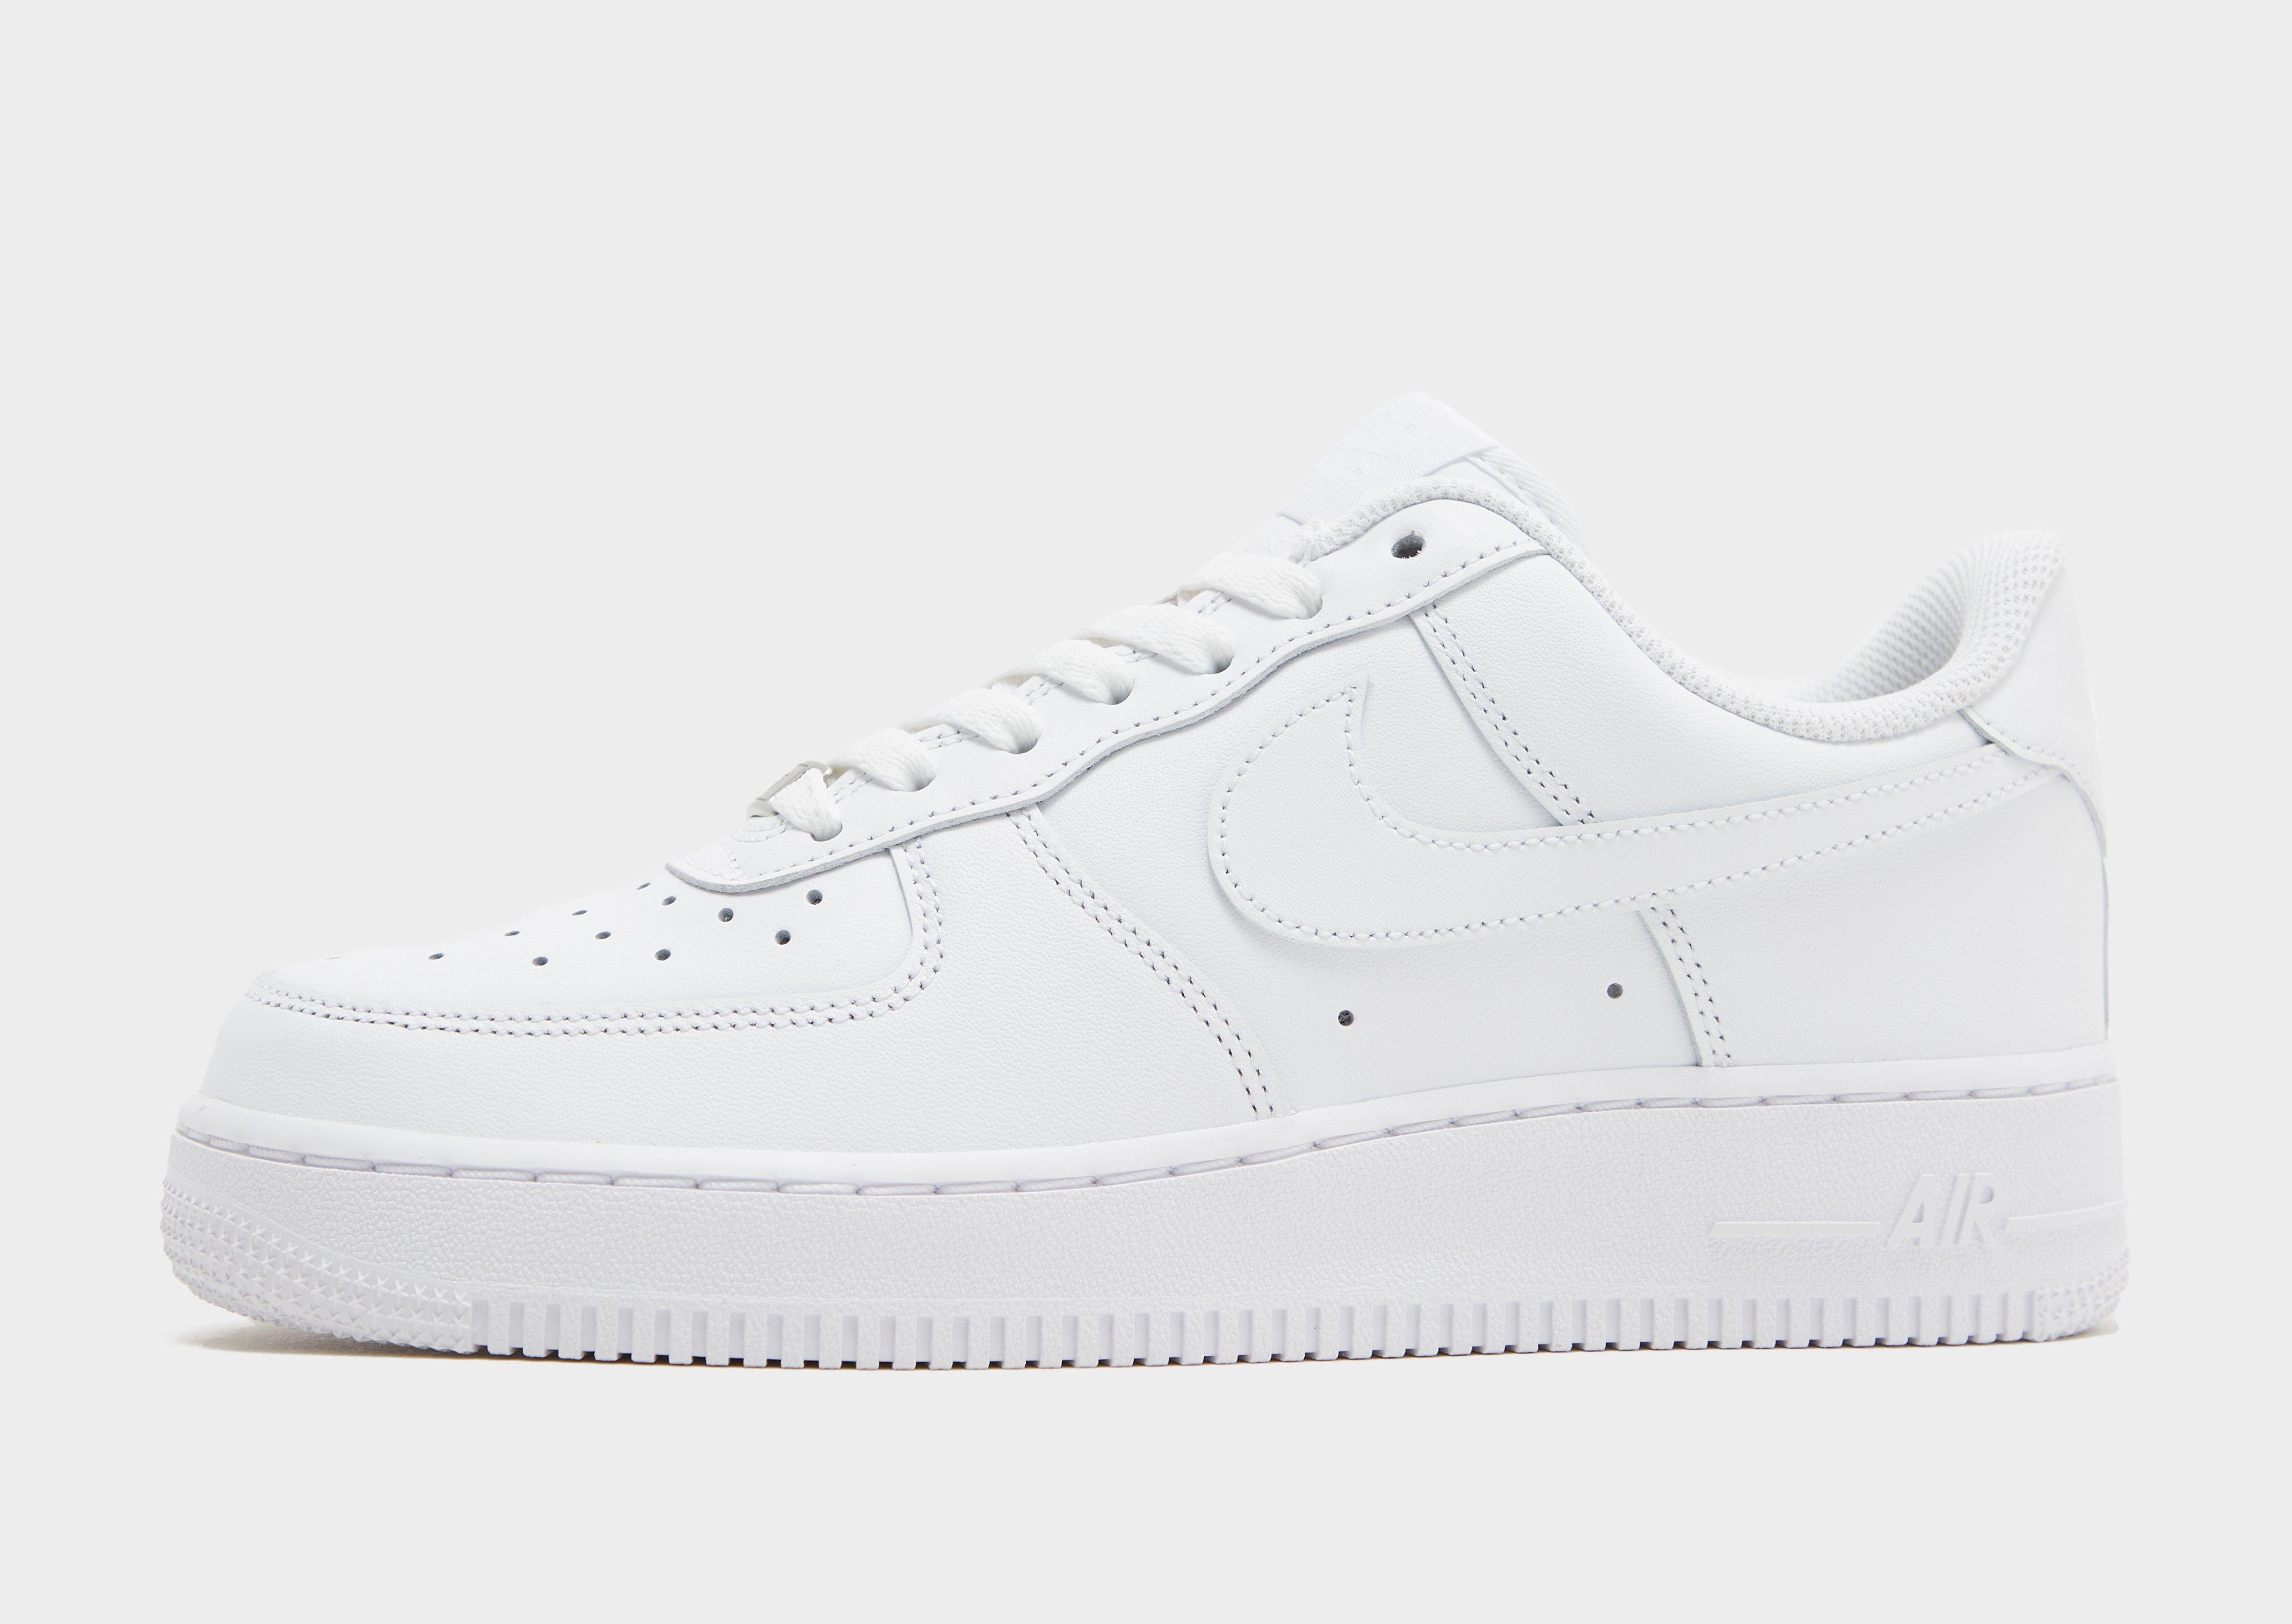 Air Force 1 Nike Bas En Haut